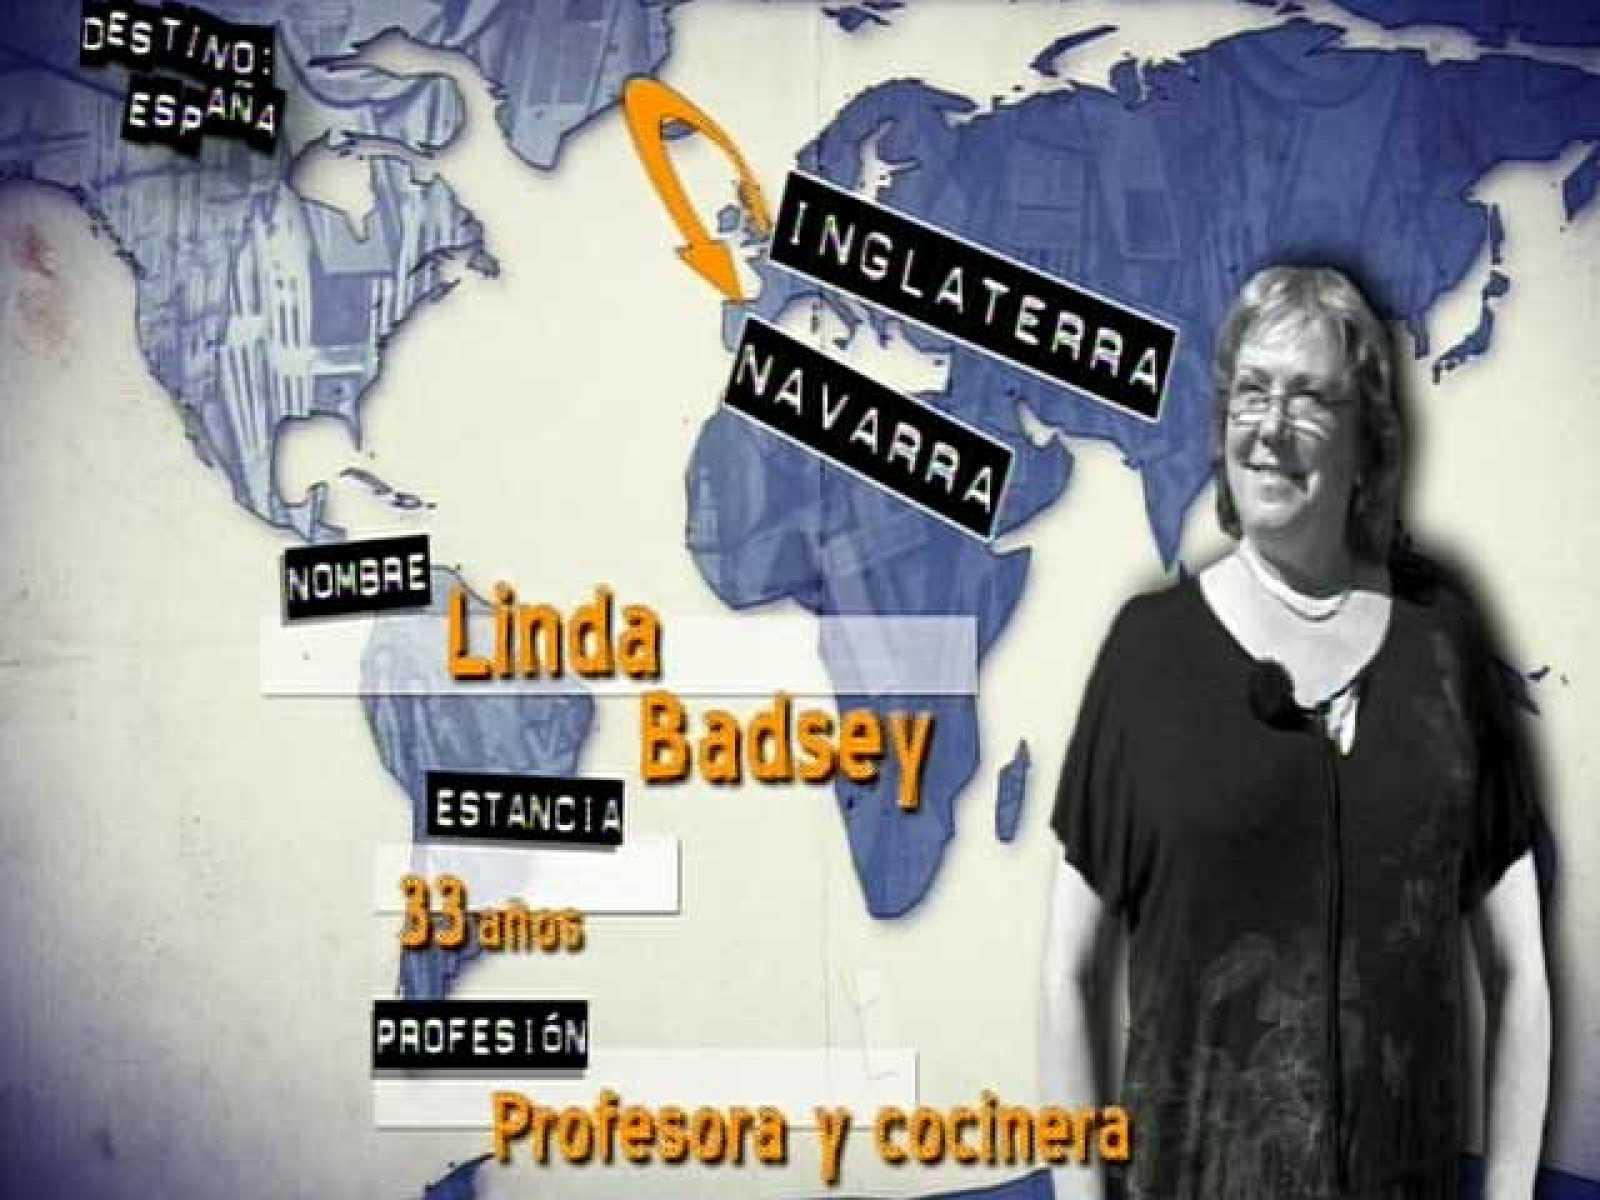 Destino: Navarra II, Linda